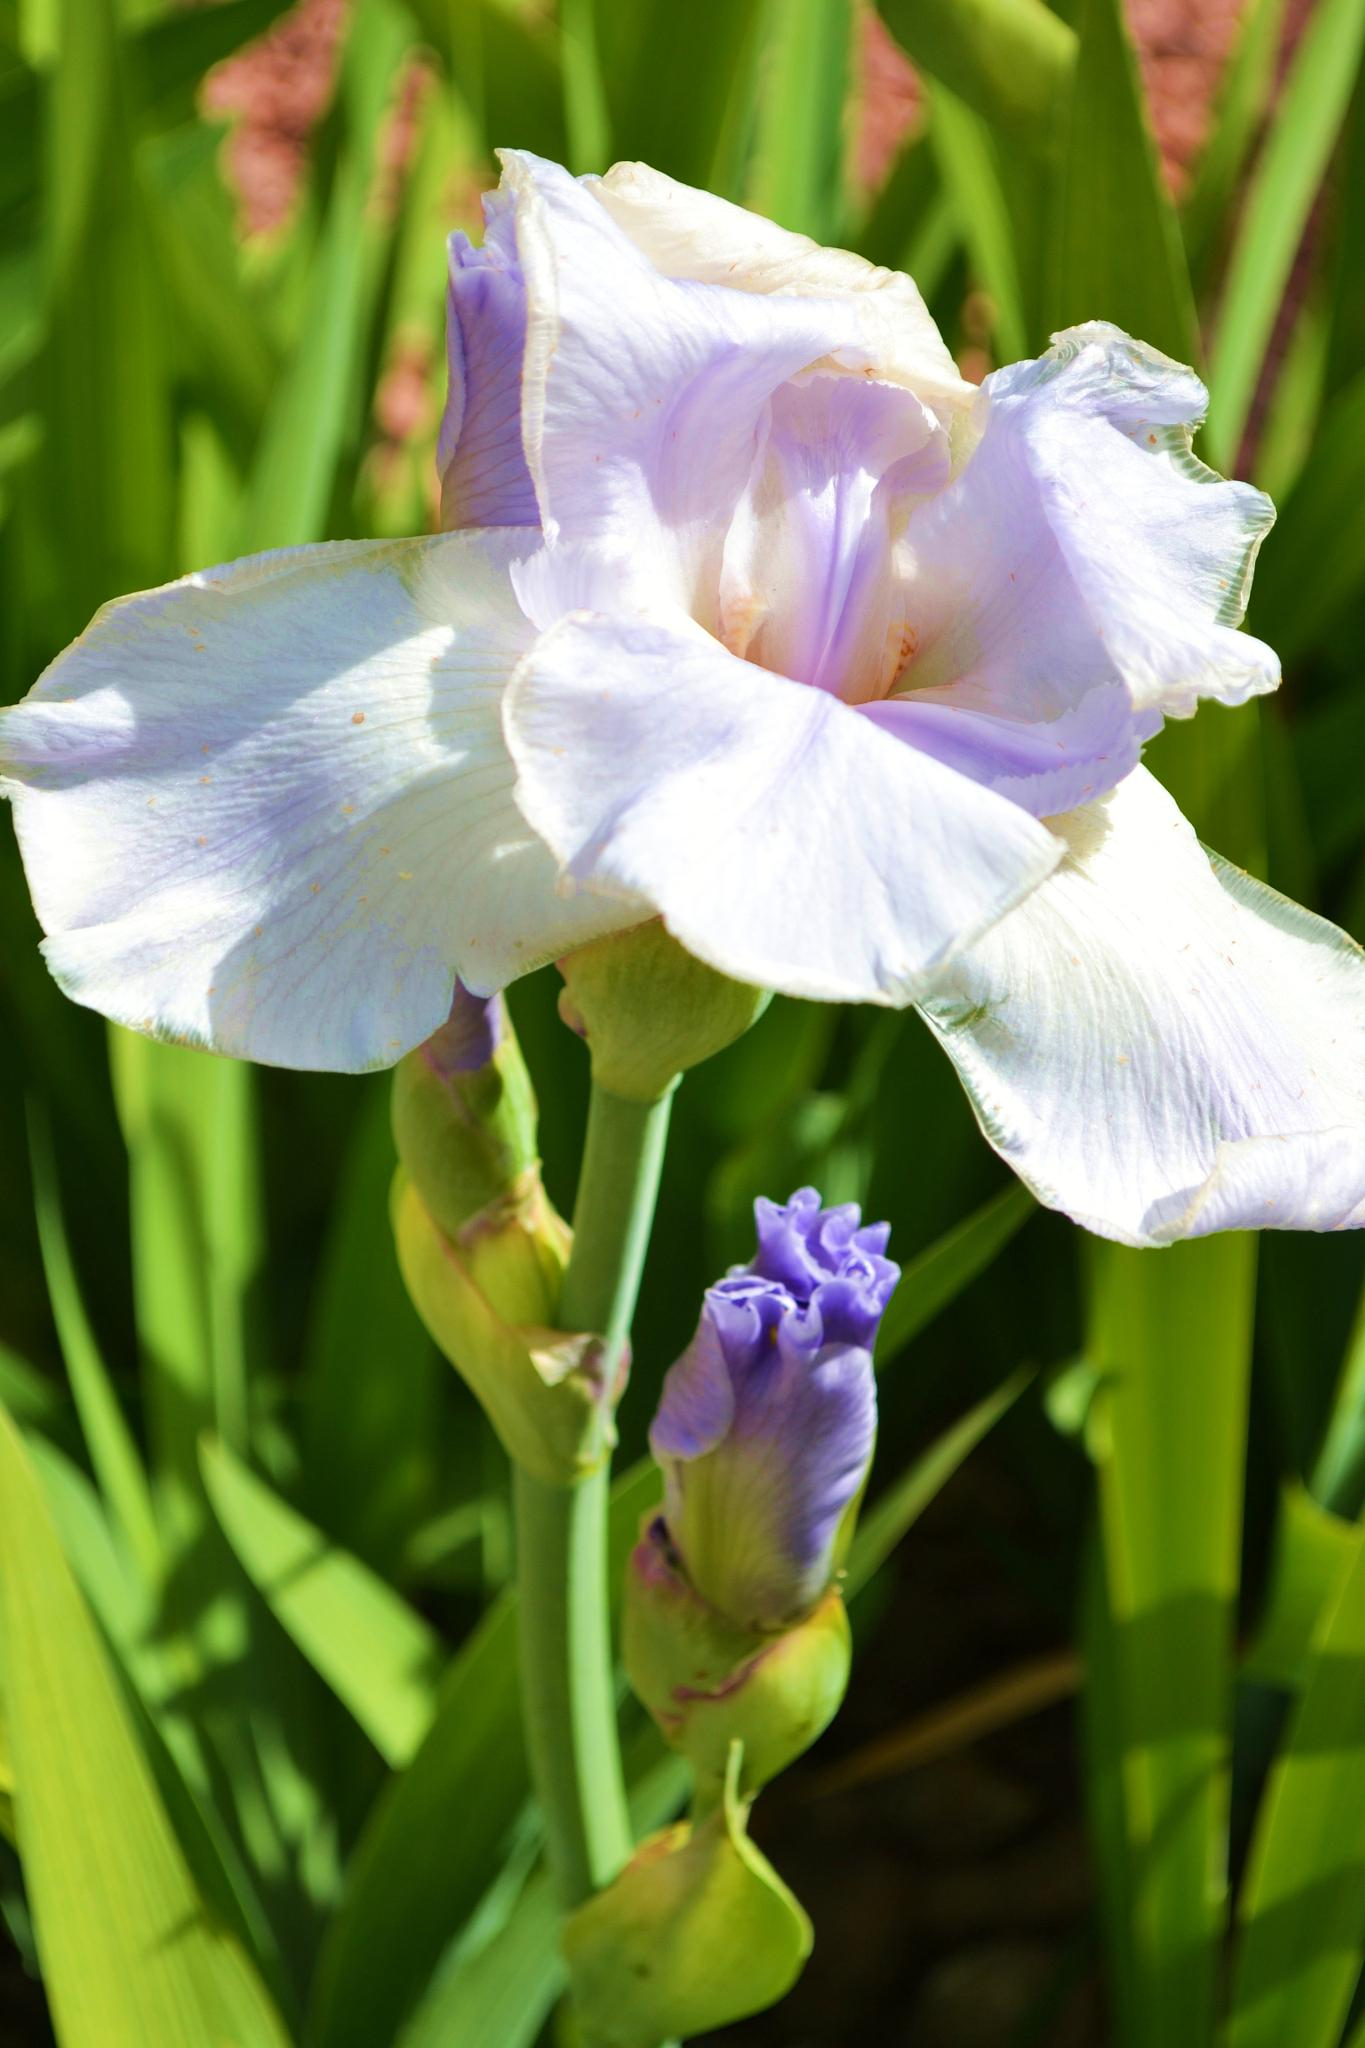 Iris by Linda Masanimptewa